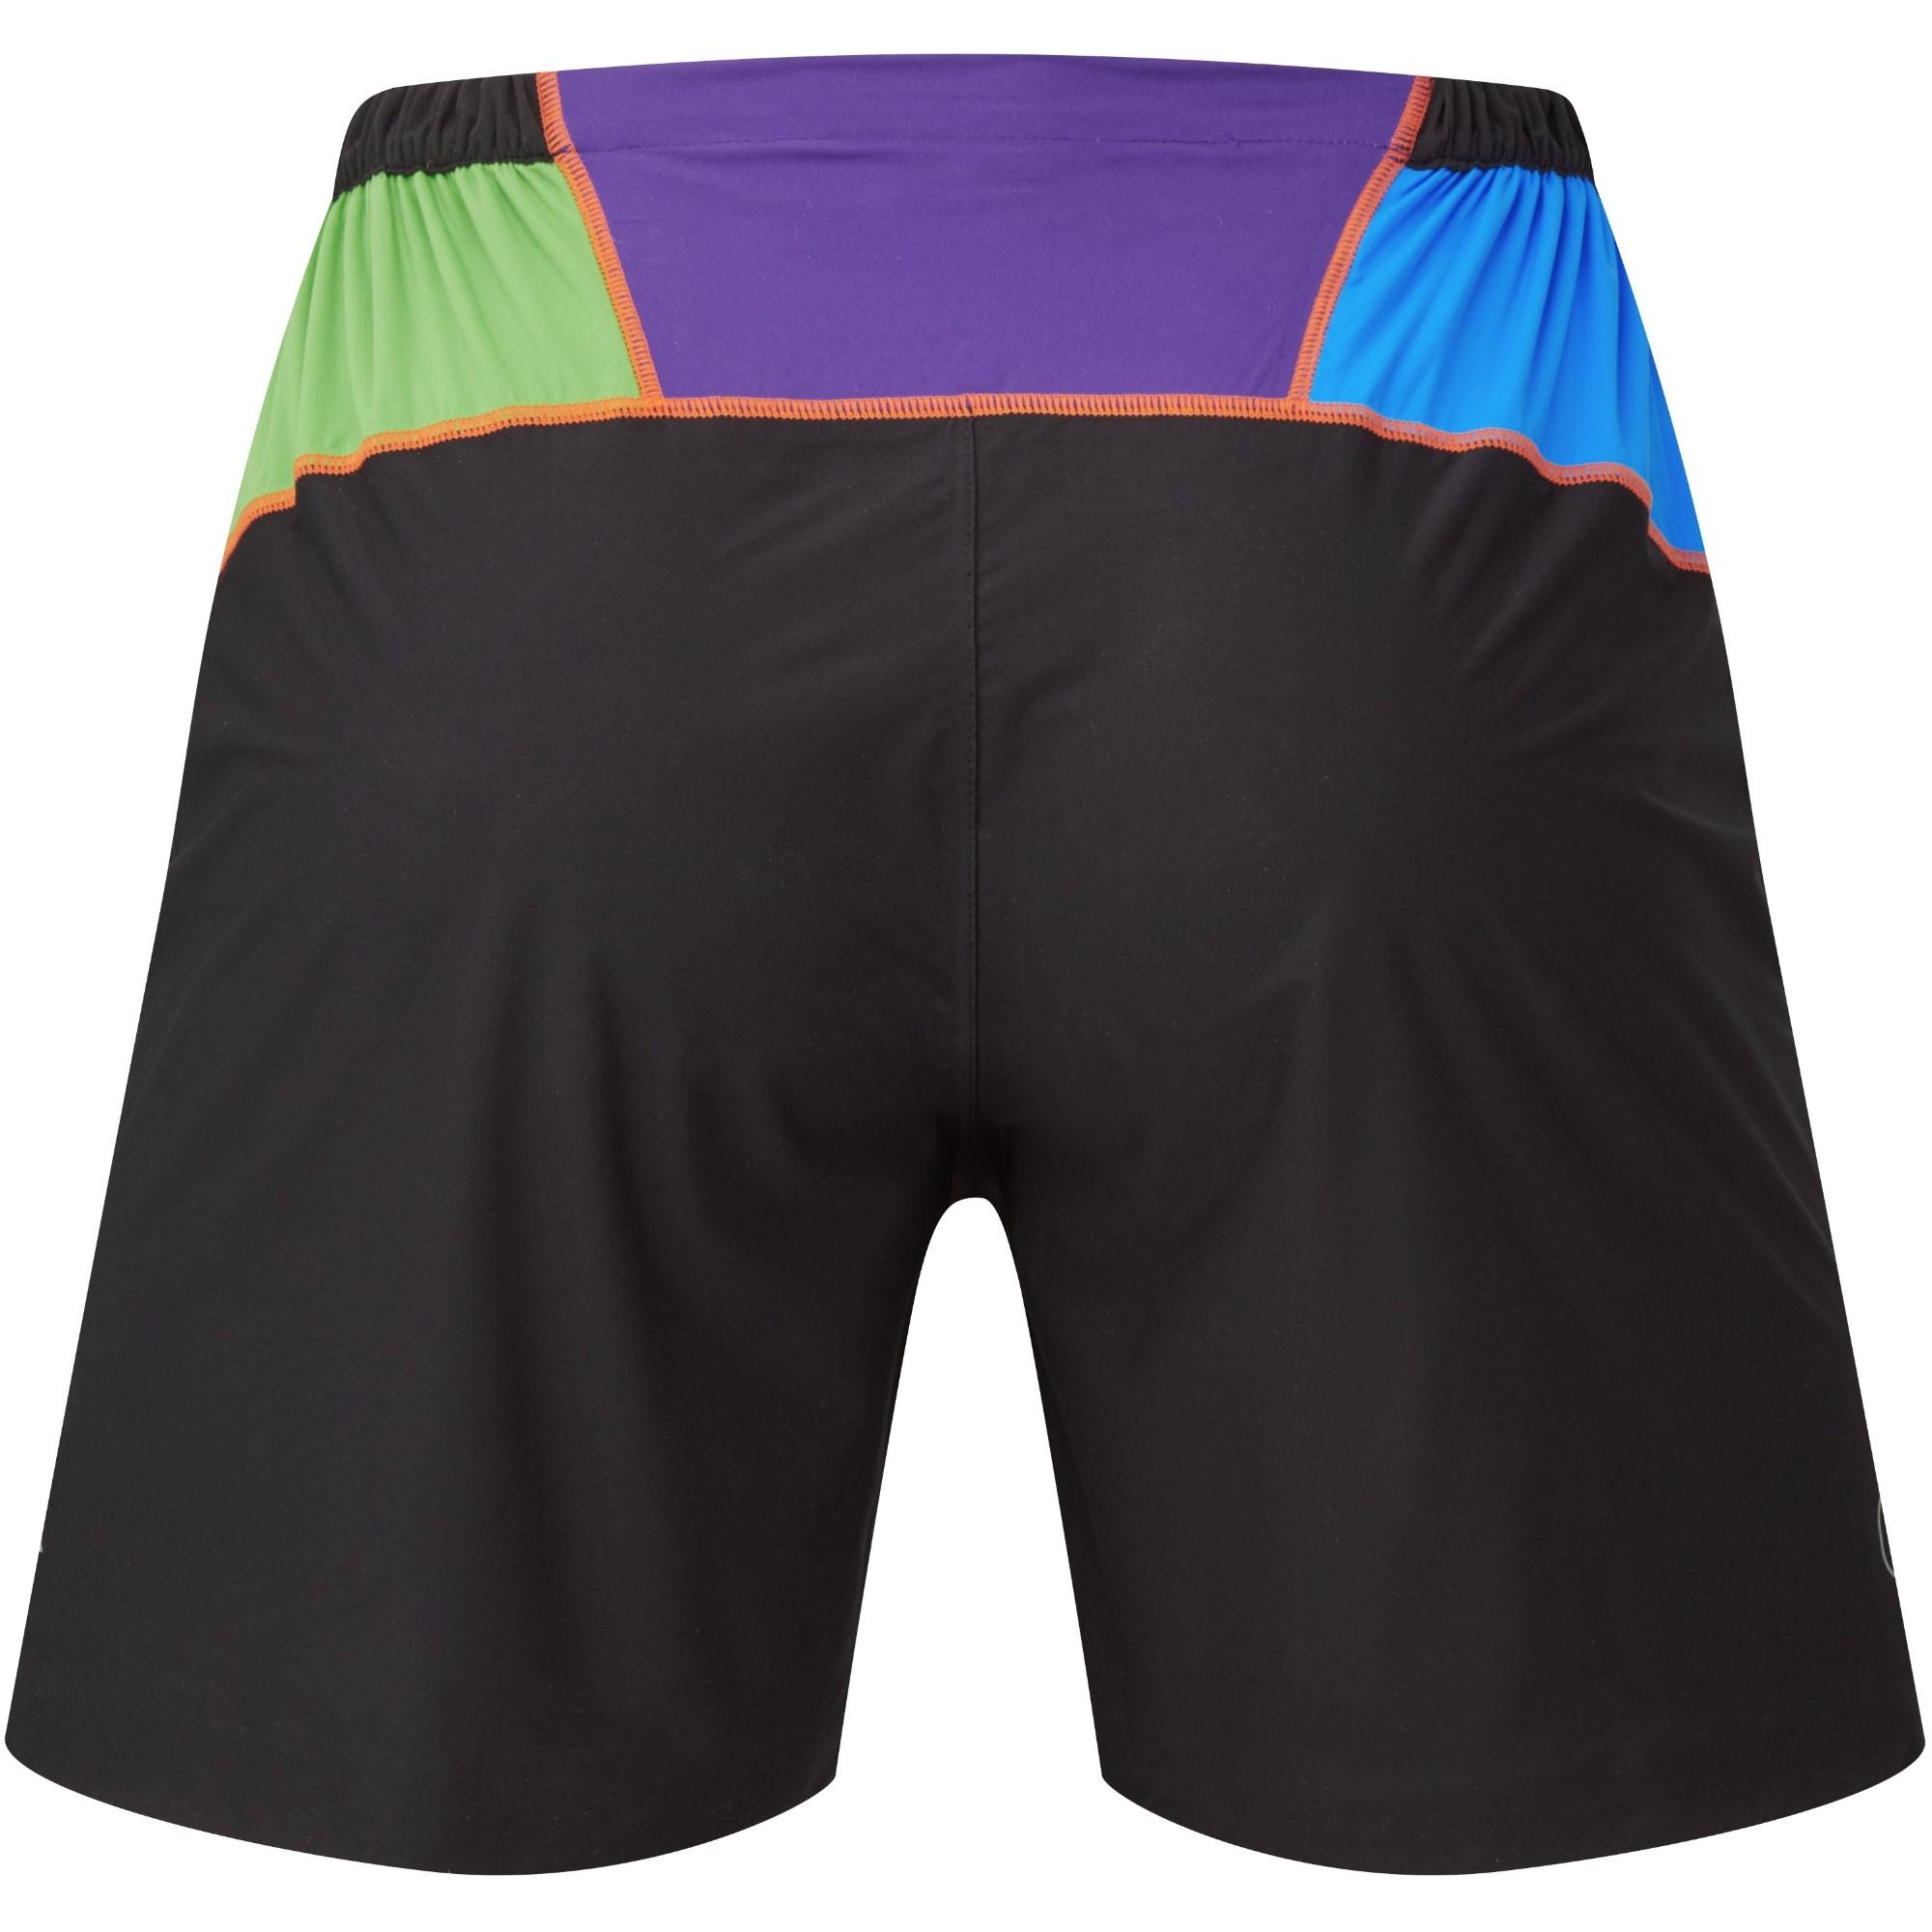 OMM Kamleika Waterproof Running Shorts - Back